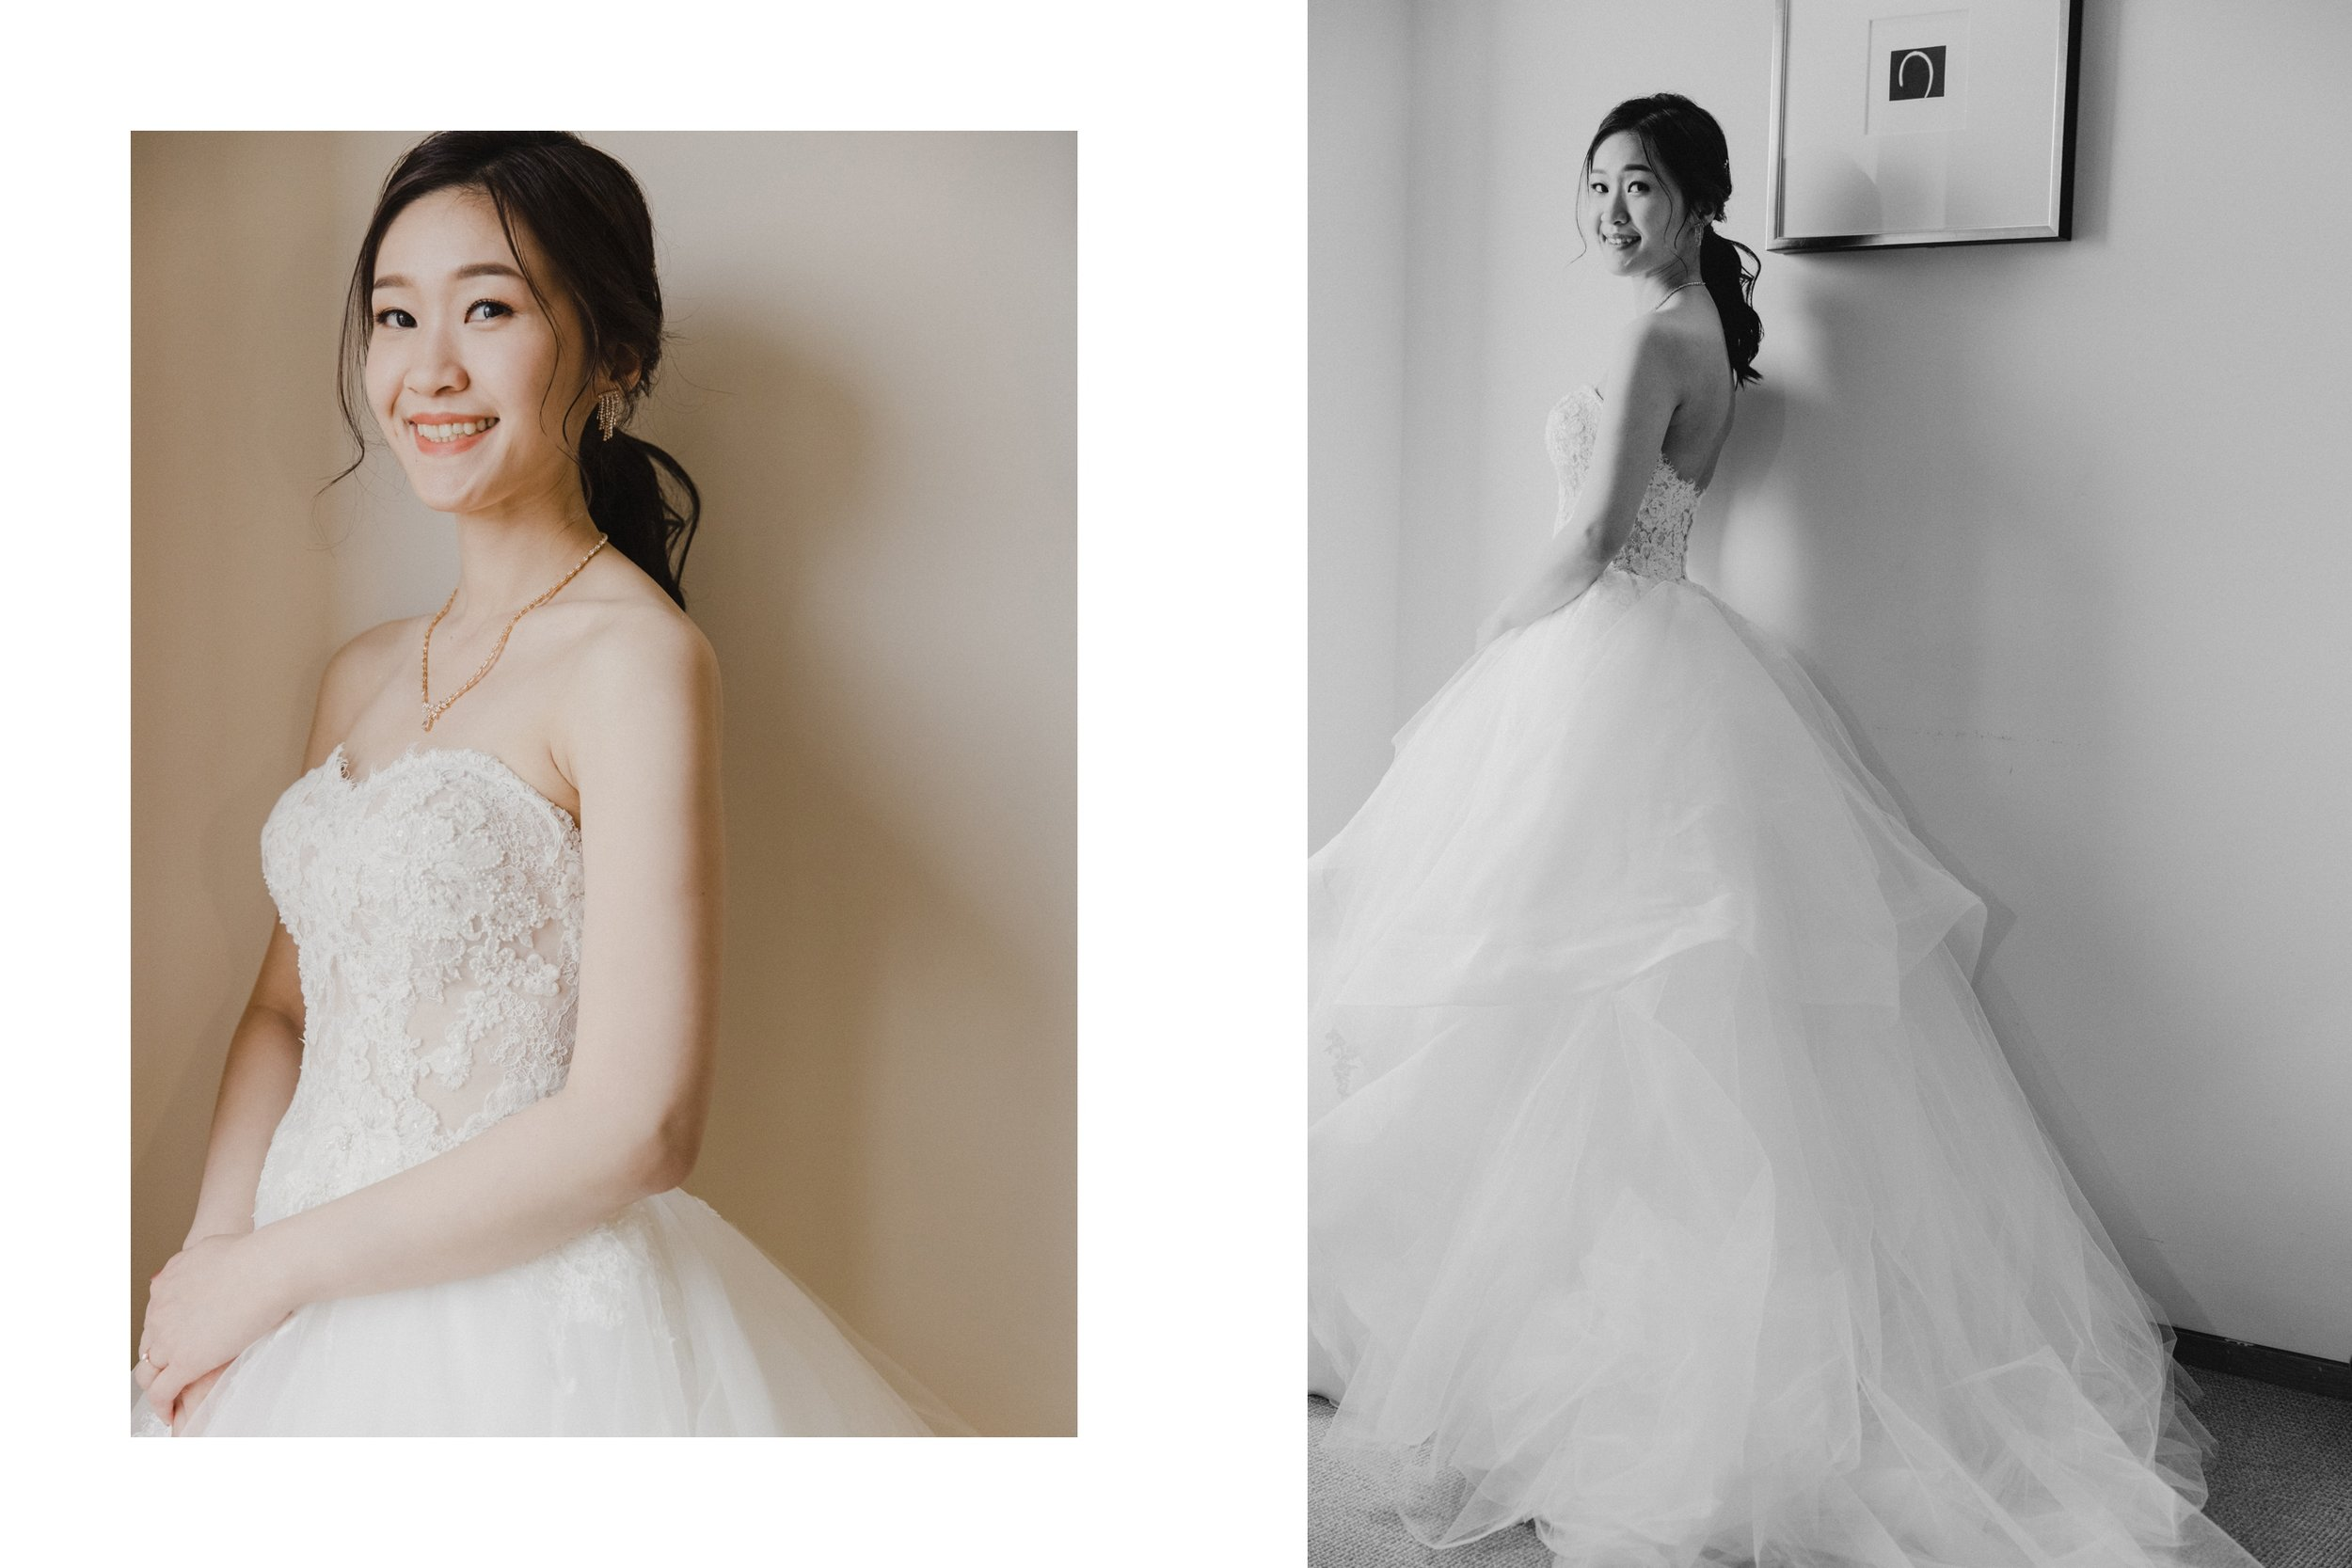 wedding-caridee-oscar-lunch-ambassador-hsinchu-結婚午宴-新竹國賓_24.jpg